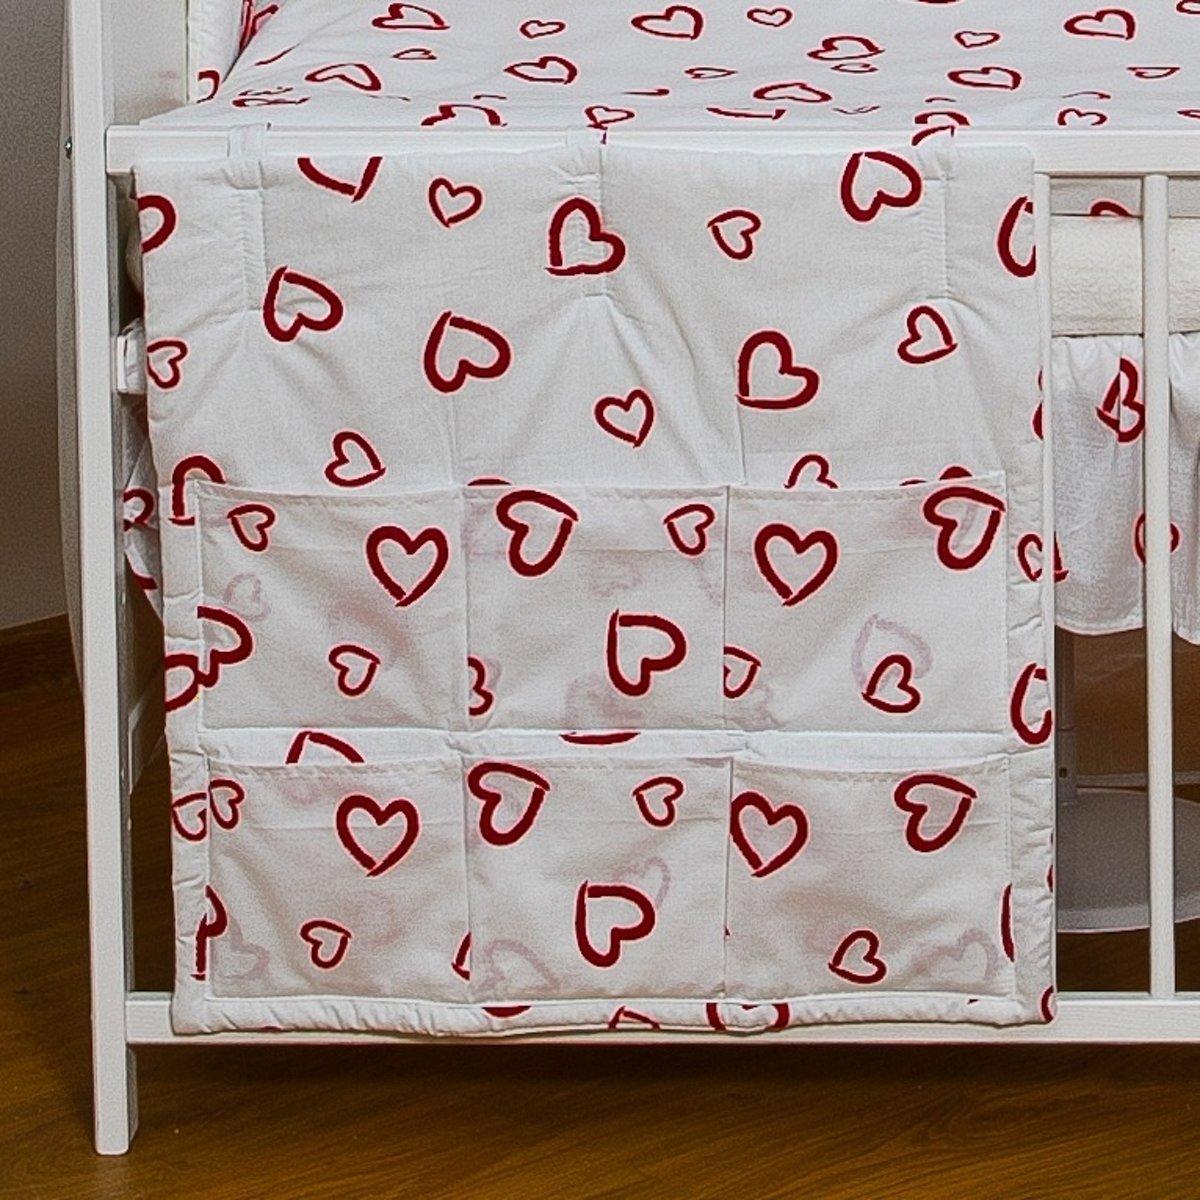 Organizer - 60x60cm voor ledikant - rode hartjes